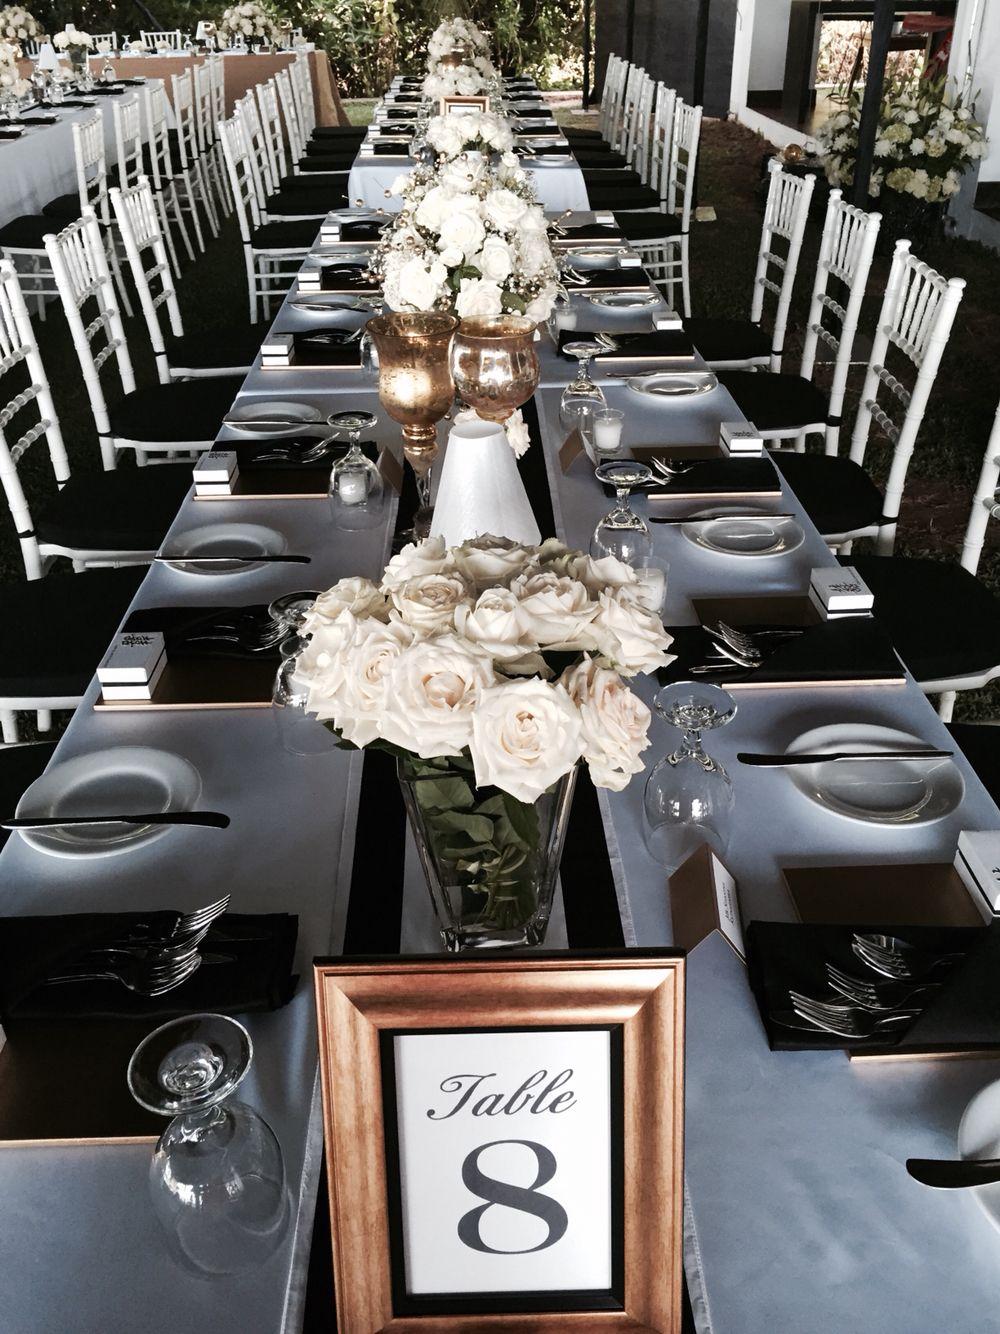 Wedding decor set up inside marquee jetwing lagoon negombo wedding decor set up inside marquee jetwing lagoon negombo wedding planner weddings by junglespirit Gallery